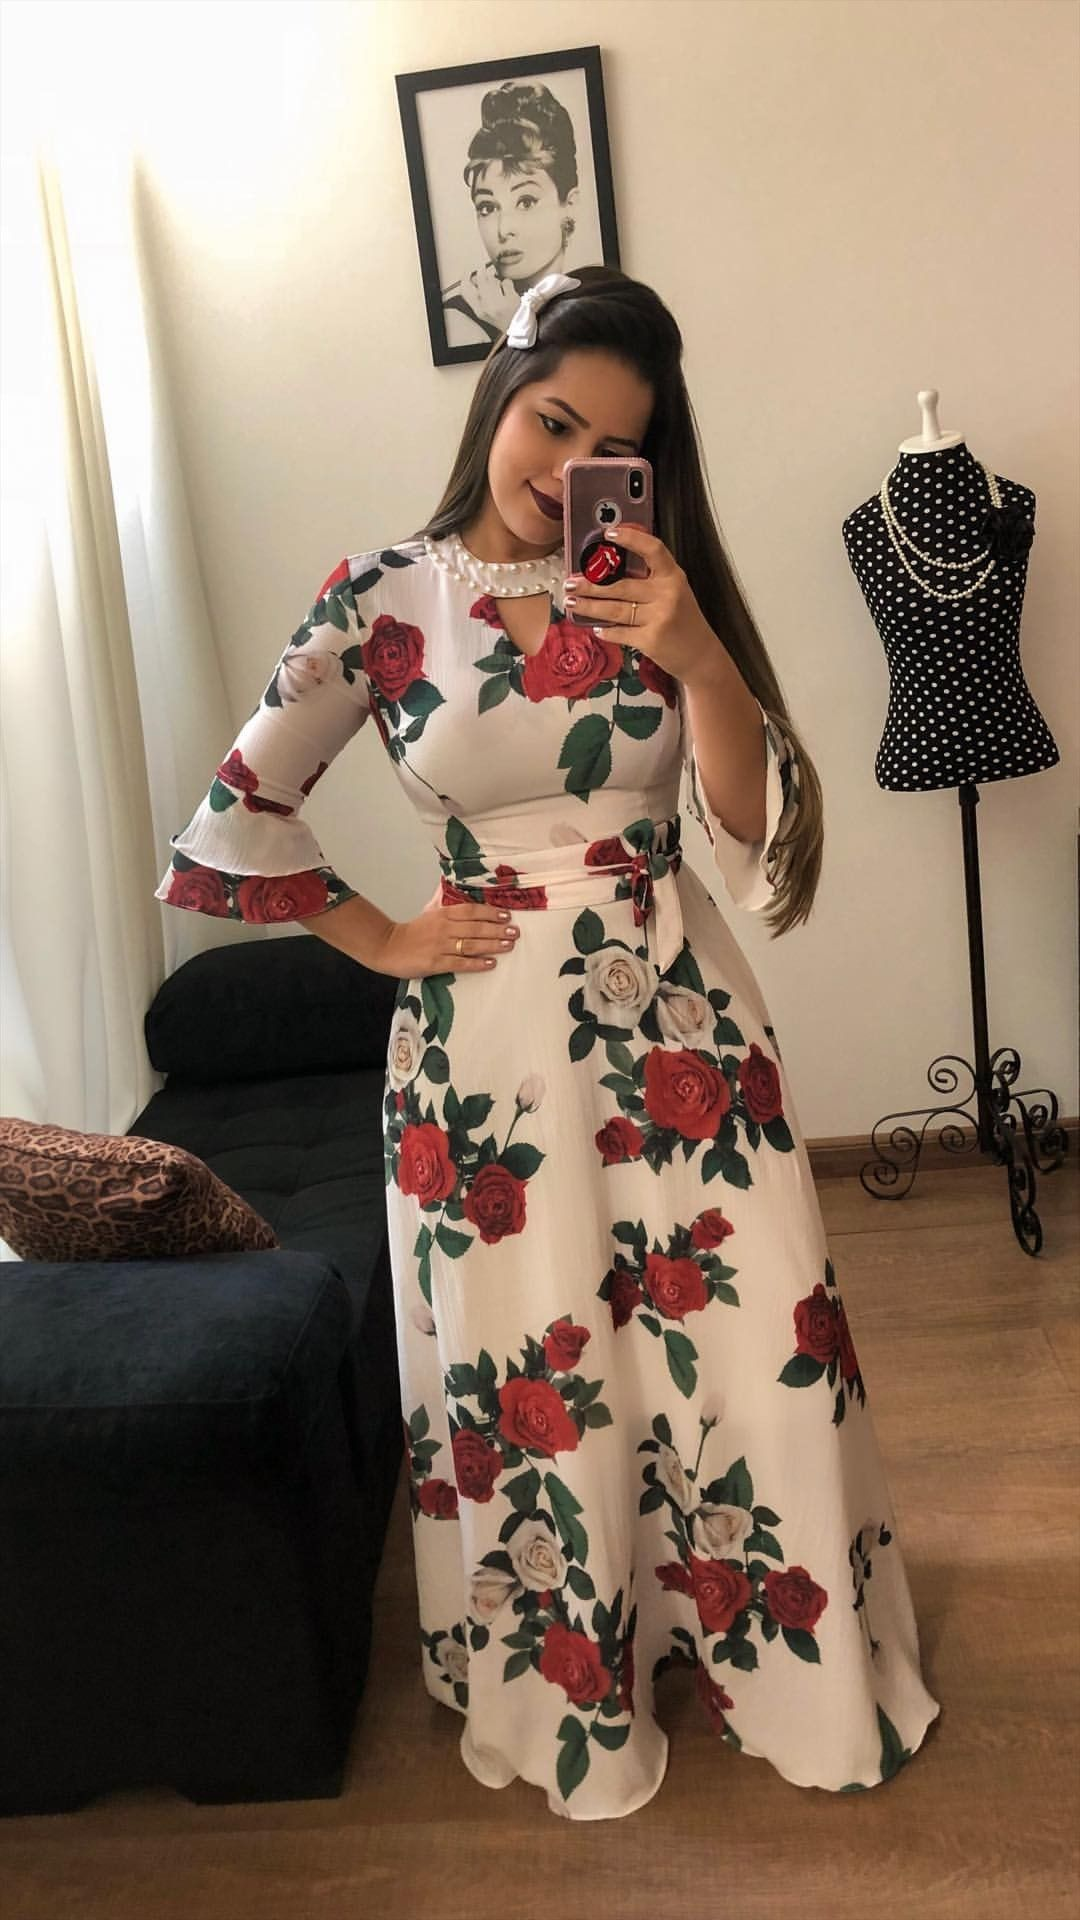 ff1cc4ff9 mustachestore  dress  vestido  estampa  lindo  rosas  flores  floral ...